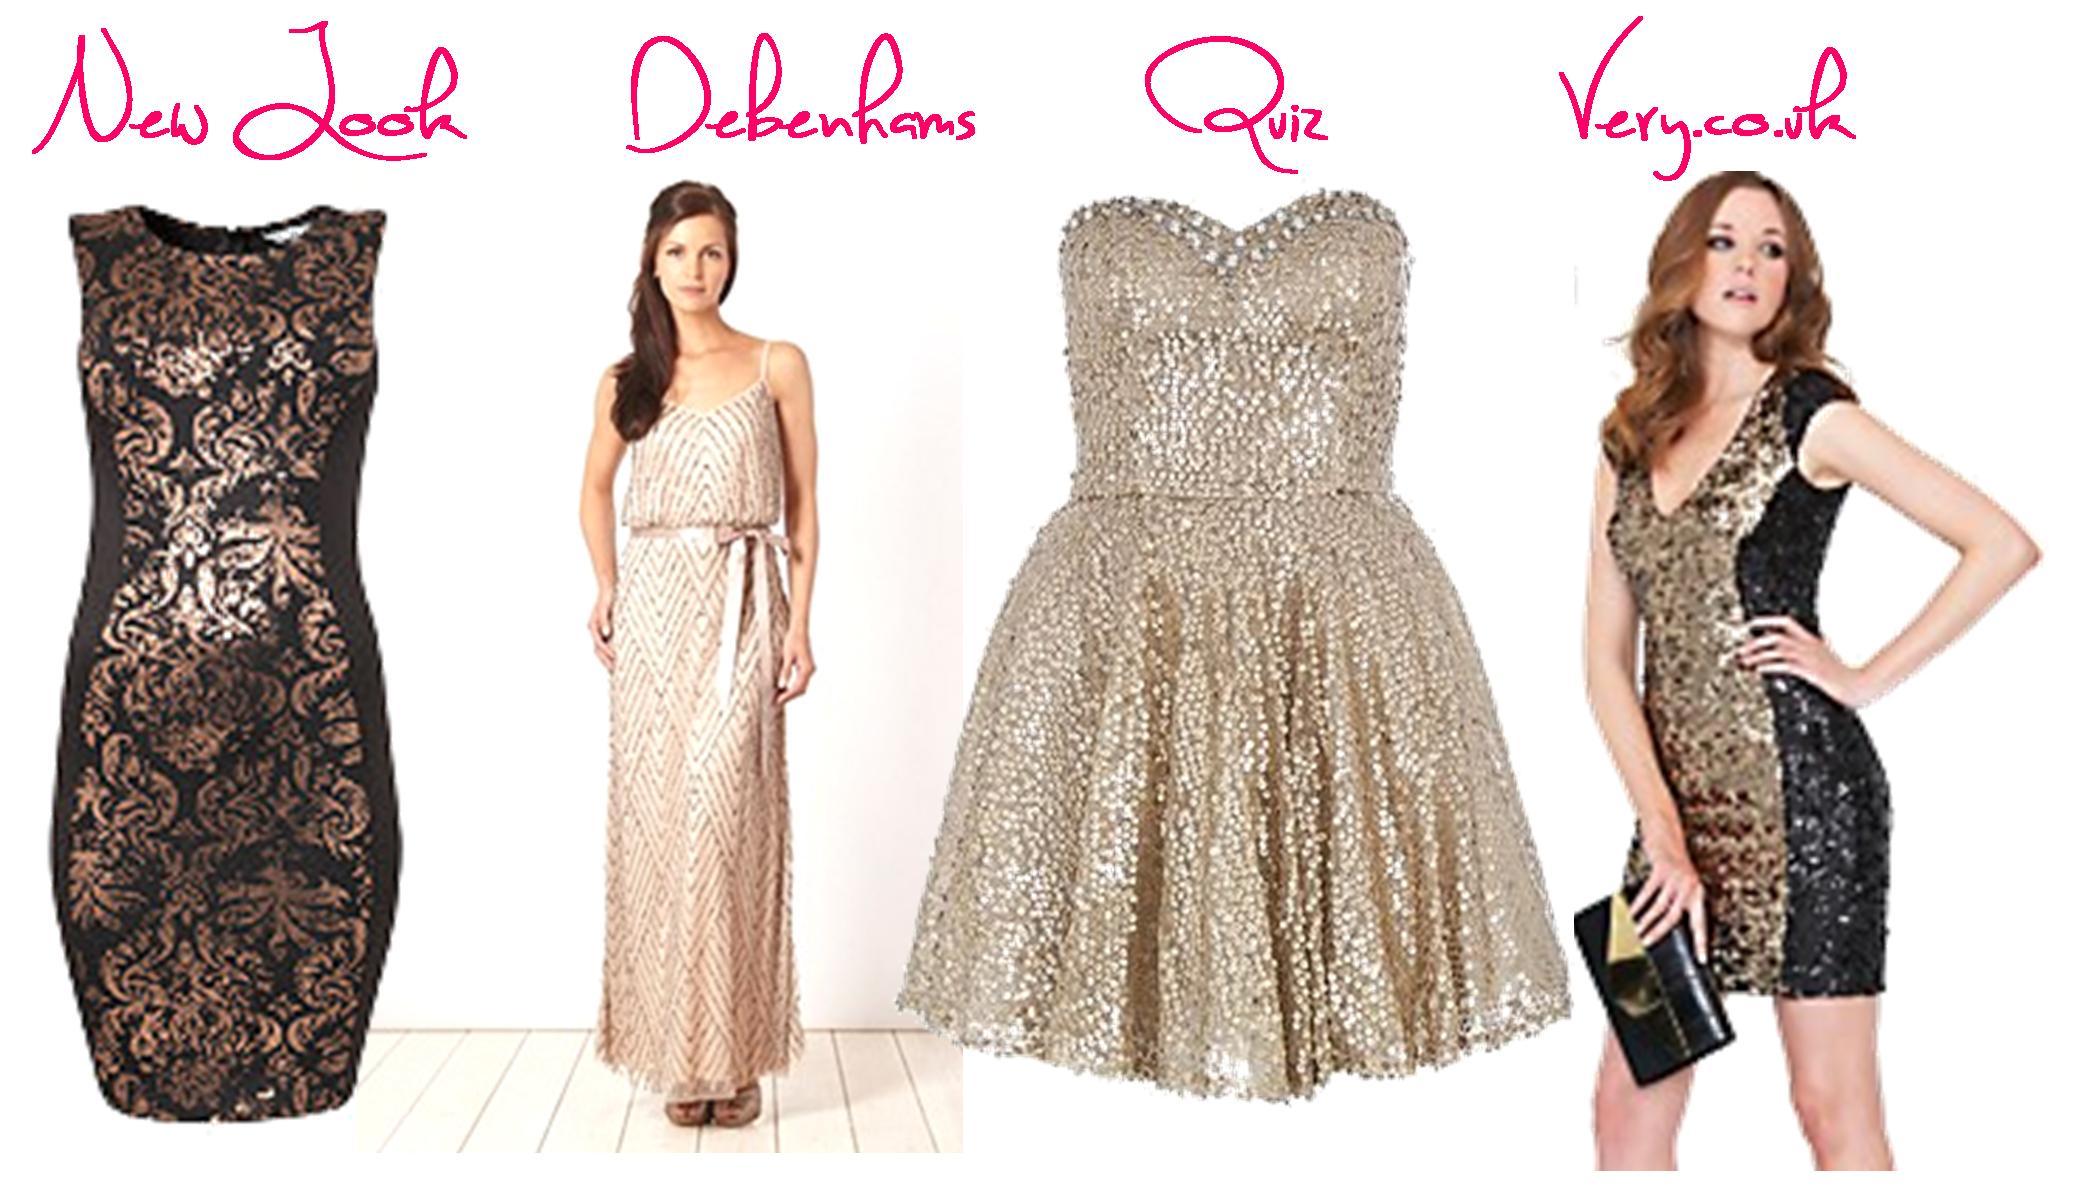 fa2b50e502ba christmas dresses silver gold black sequin fashion party outfits very  debenhams quiz new look